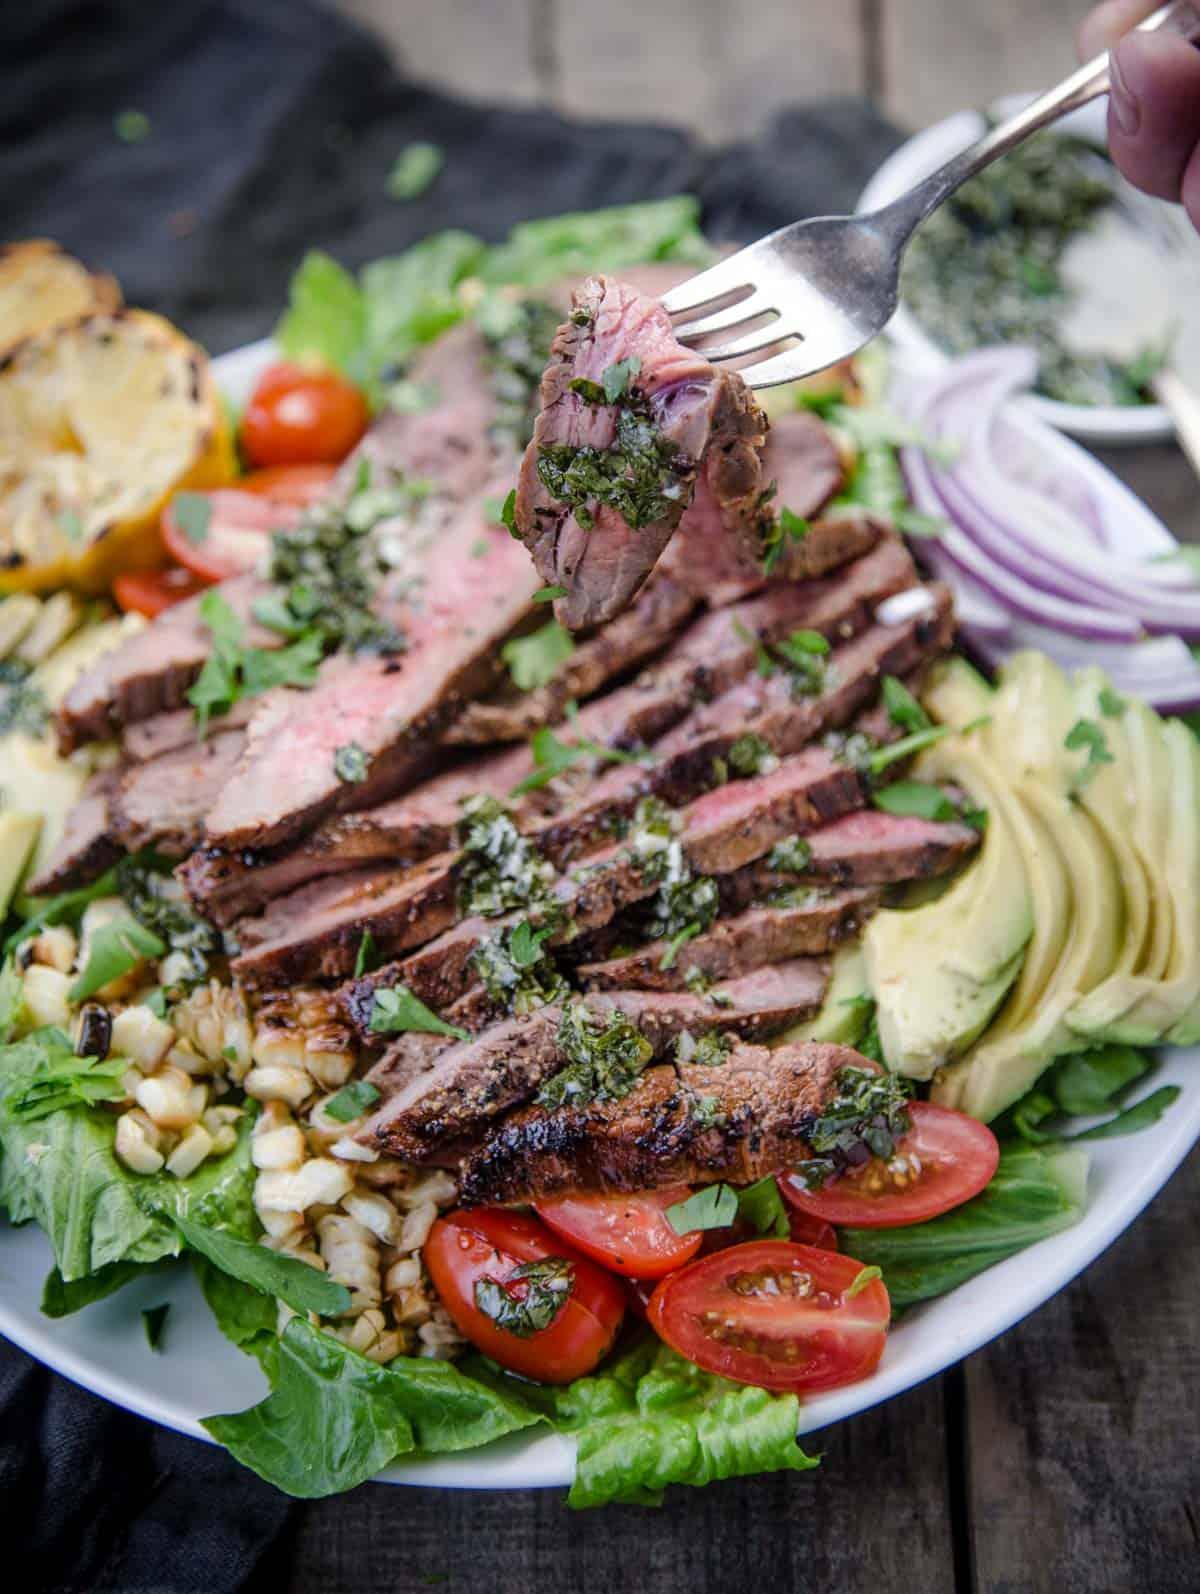 A bite of a steak salad